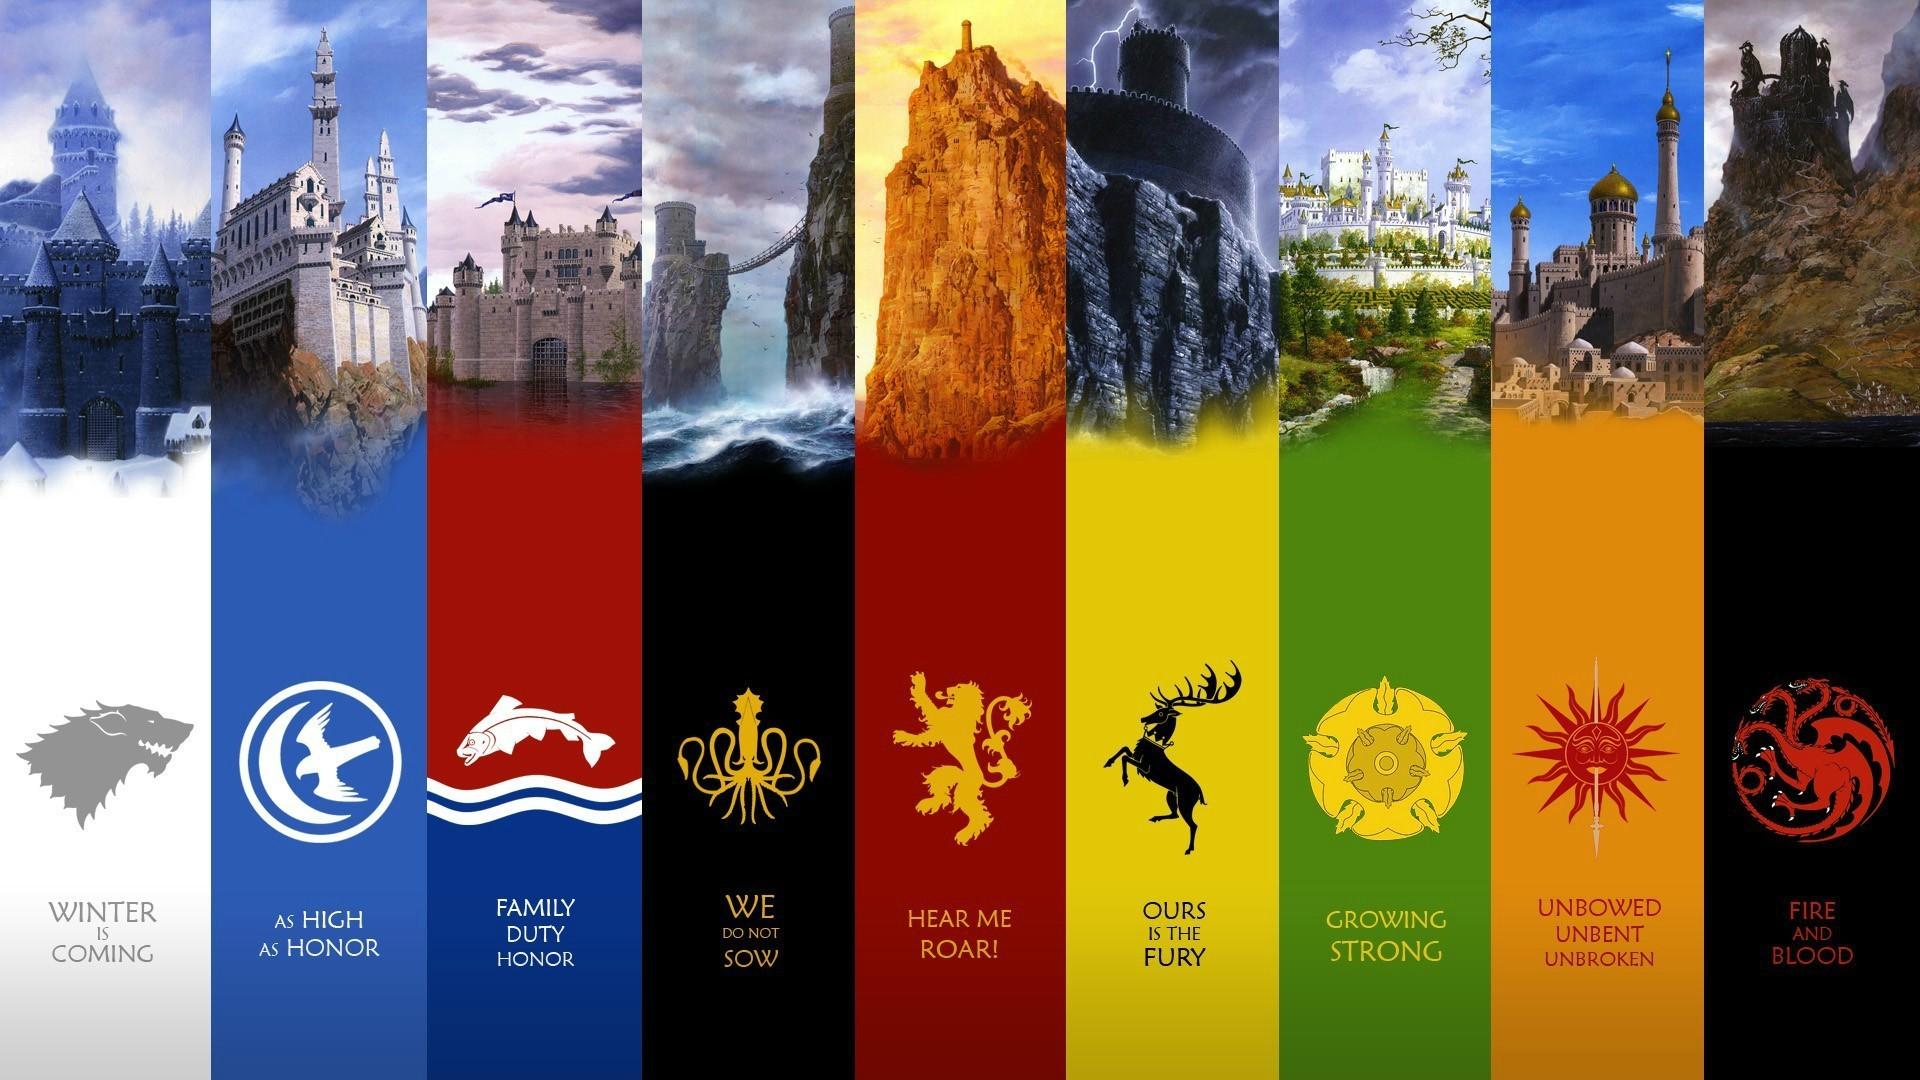 Game Of Thrones HD Desktop Mobile Wallpaper Background   9walls 1920x1080